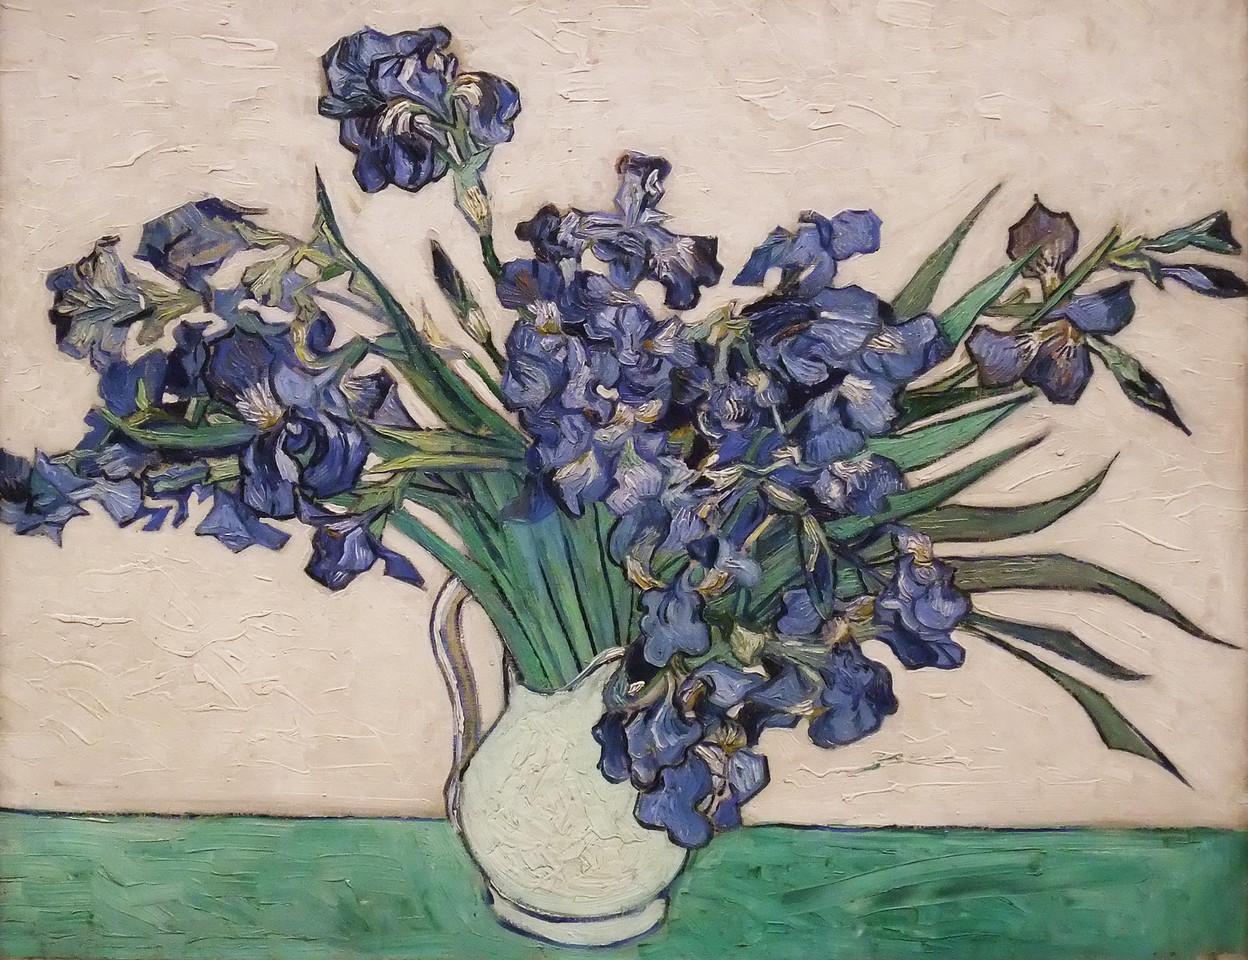 Irises<br /> Vincent van Gogh (Dutch, 1853–1890)<br /> 1890. Oil on canvas. 29 x 36 1/4 in.<br /> Metropolitan Museum of Art